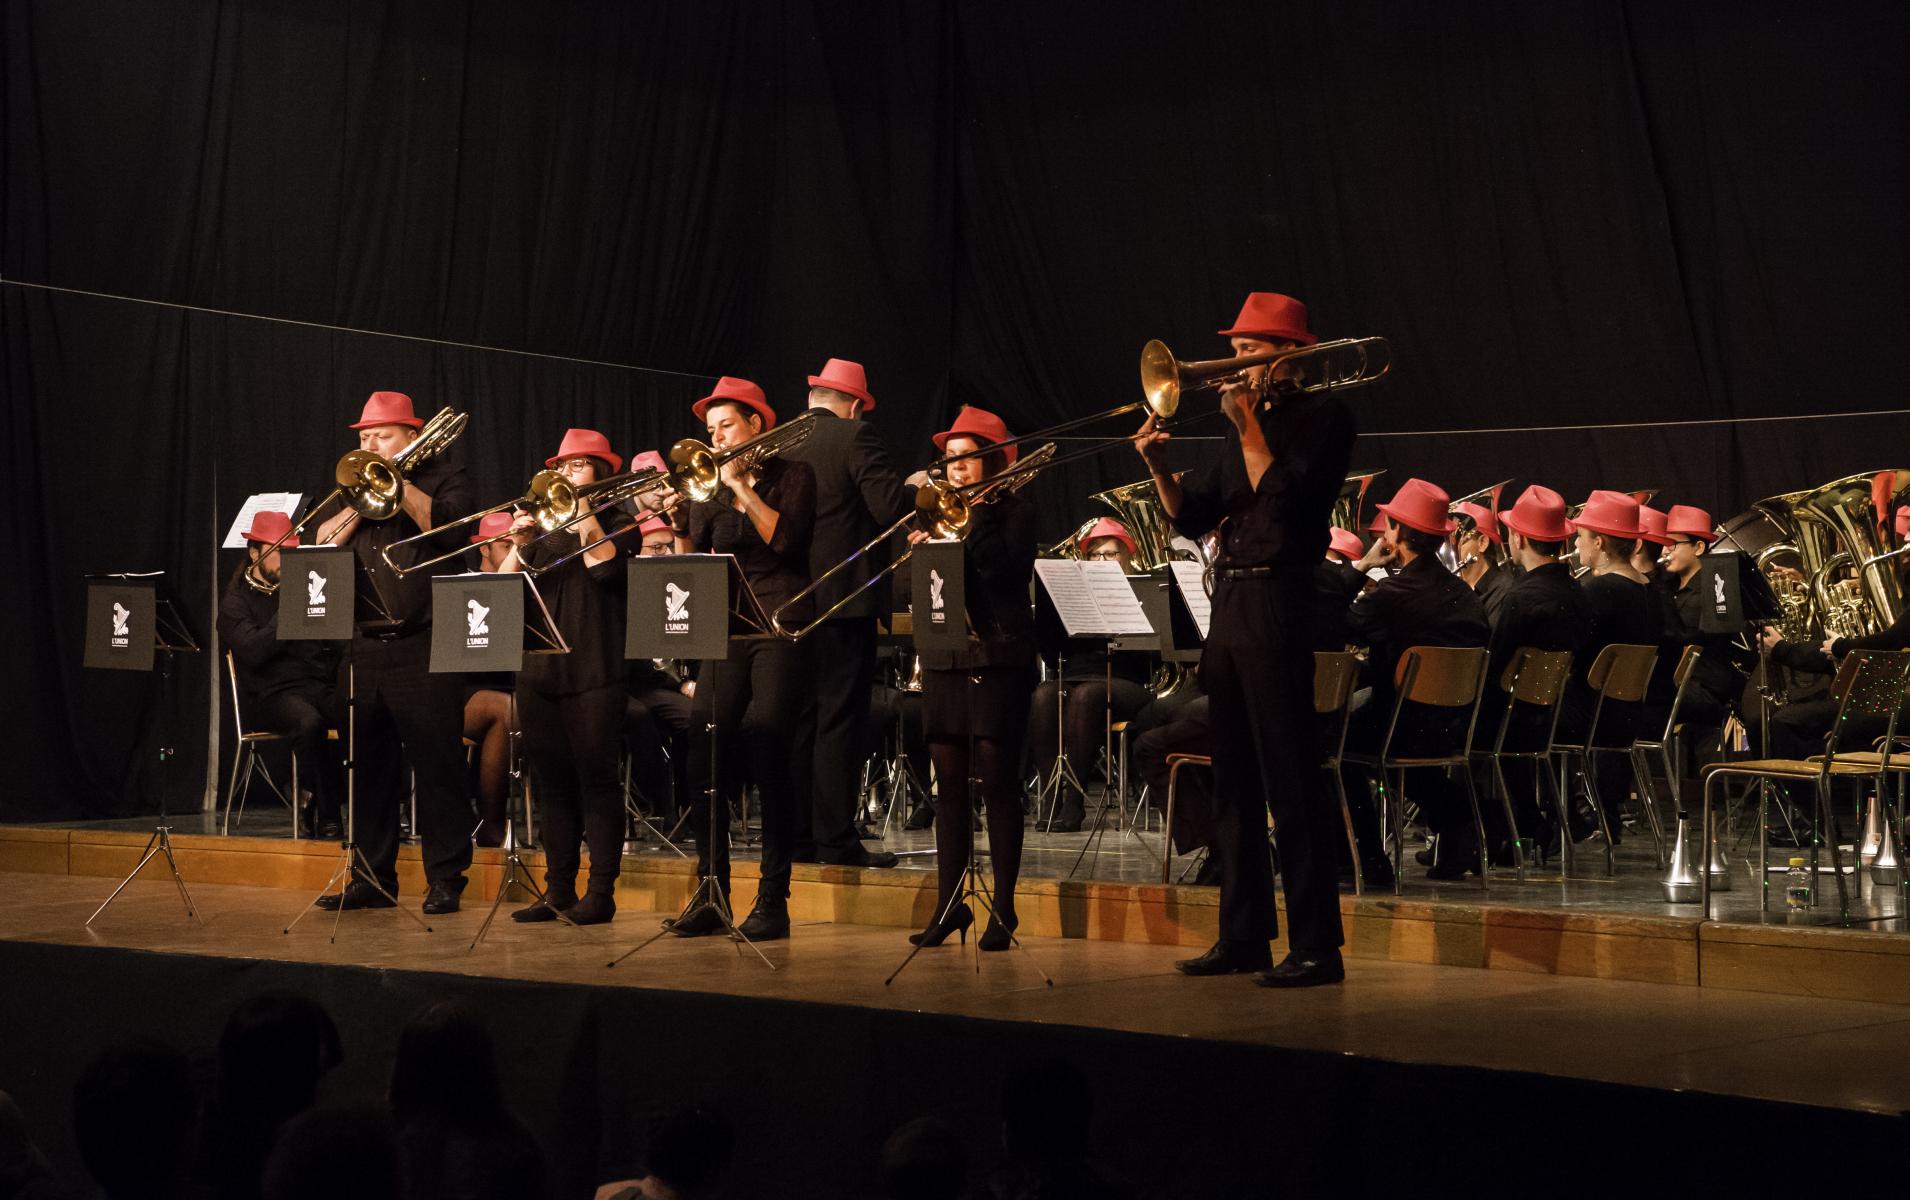 170211_concert_annuel17-068